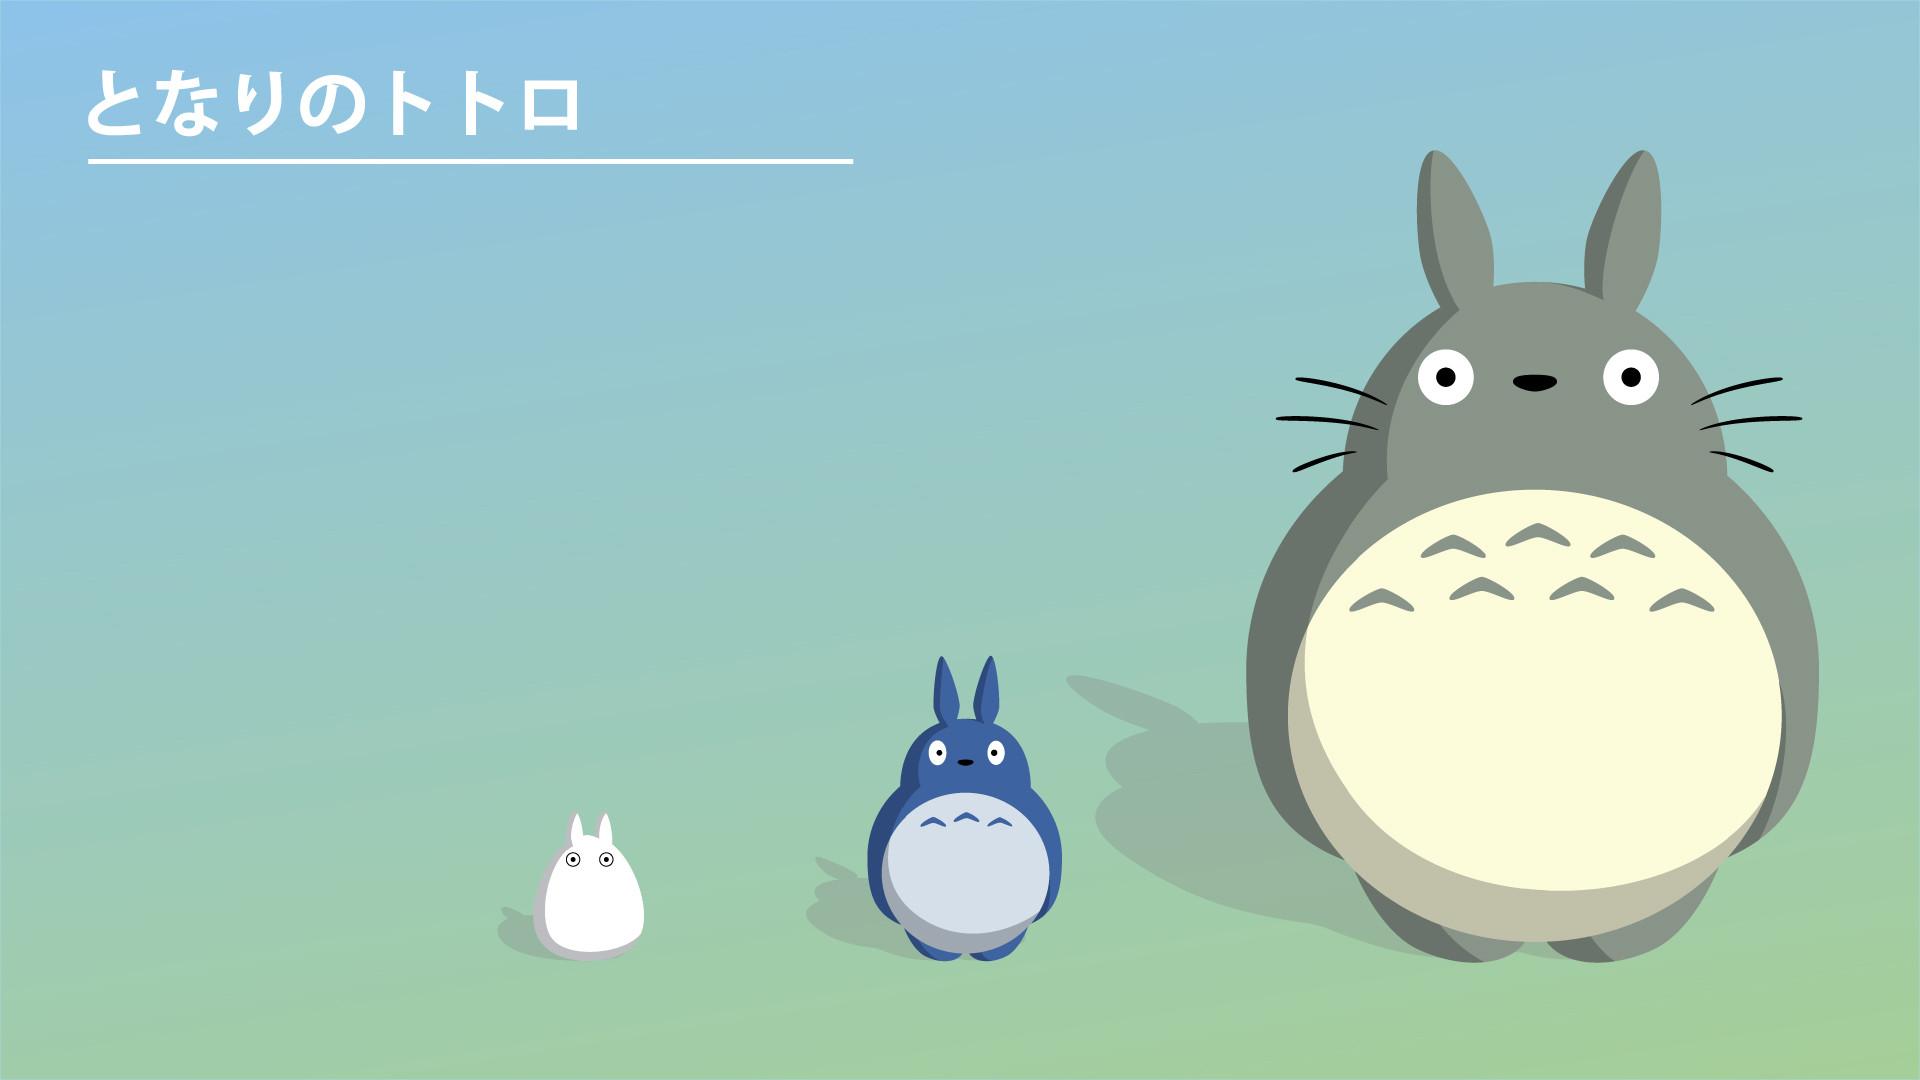 My Neighbor Totoro HD Wallpaper | | ID:35755